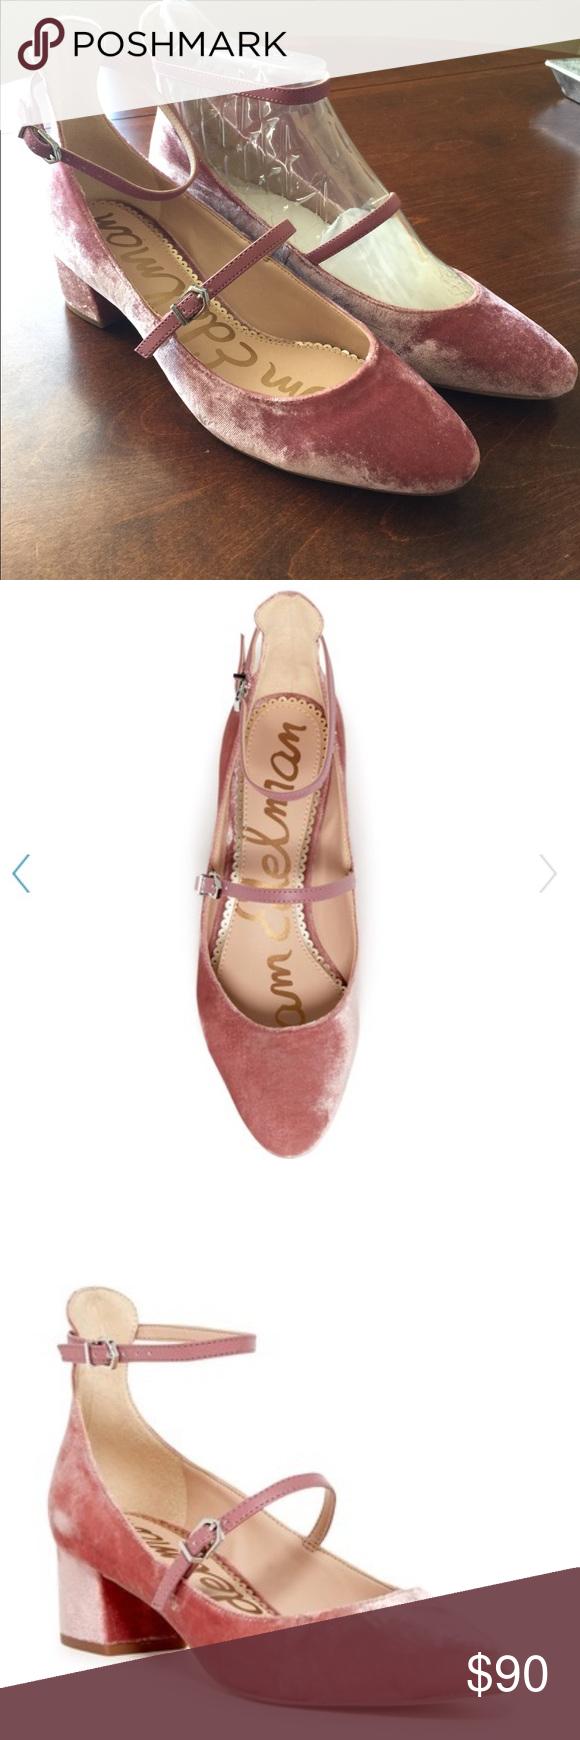 "cc0229b8b62e Sam Edelman Lulie Velvet Ankle Strap Pump NWT 1.75"" inch heel. Blush velvet.  New in box block strap heels. Adjustable straps. Almond toe."